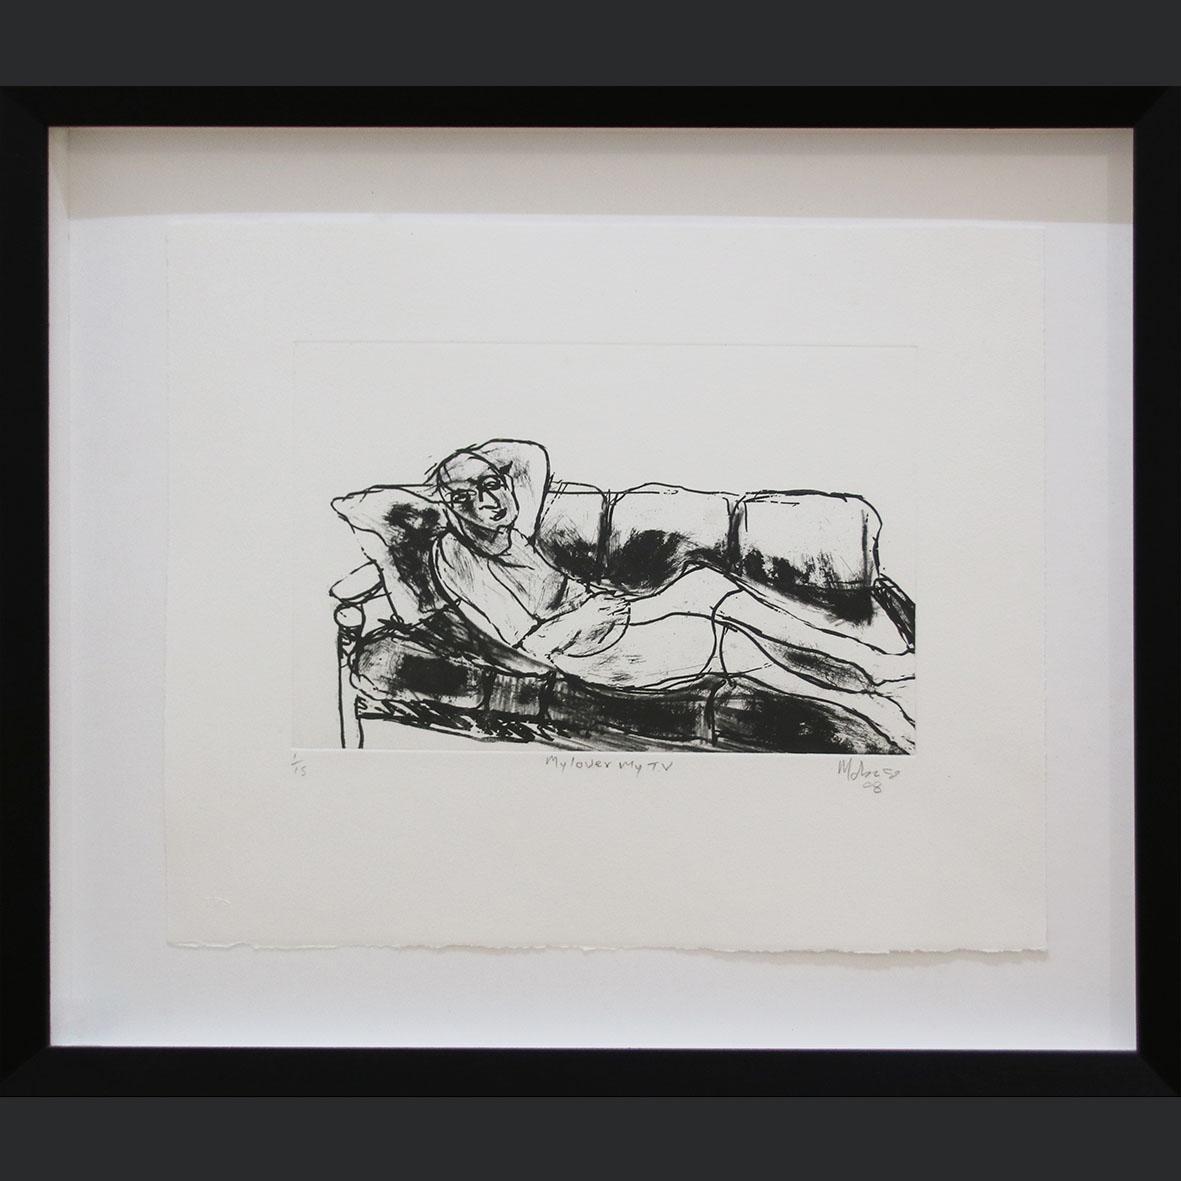 Dumisani Mabaso, My Lover My TV , signed 2008 - etching 1 of 15, 56 x 50.5 cm